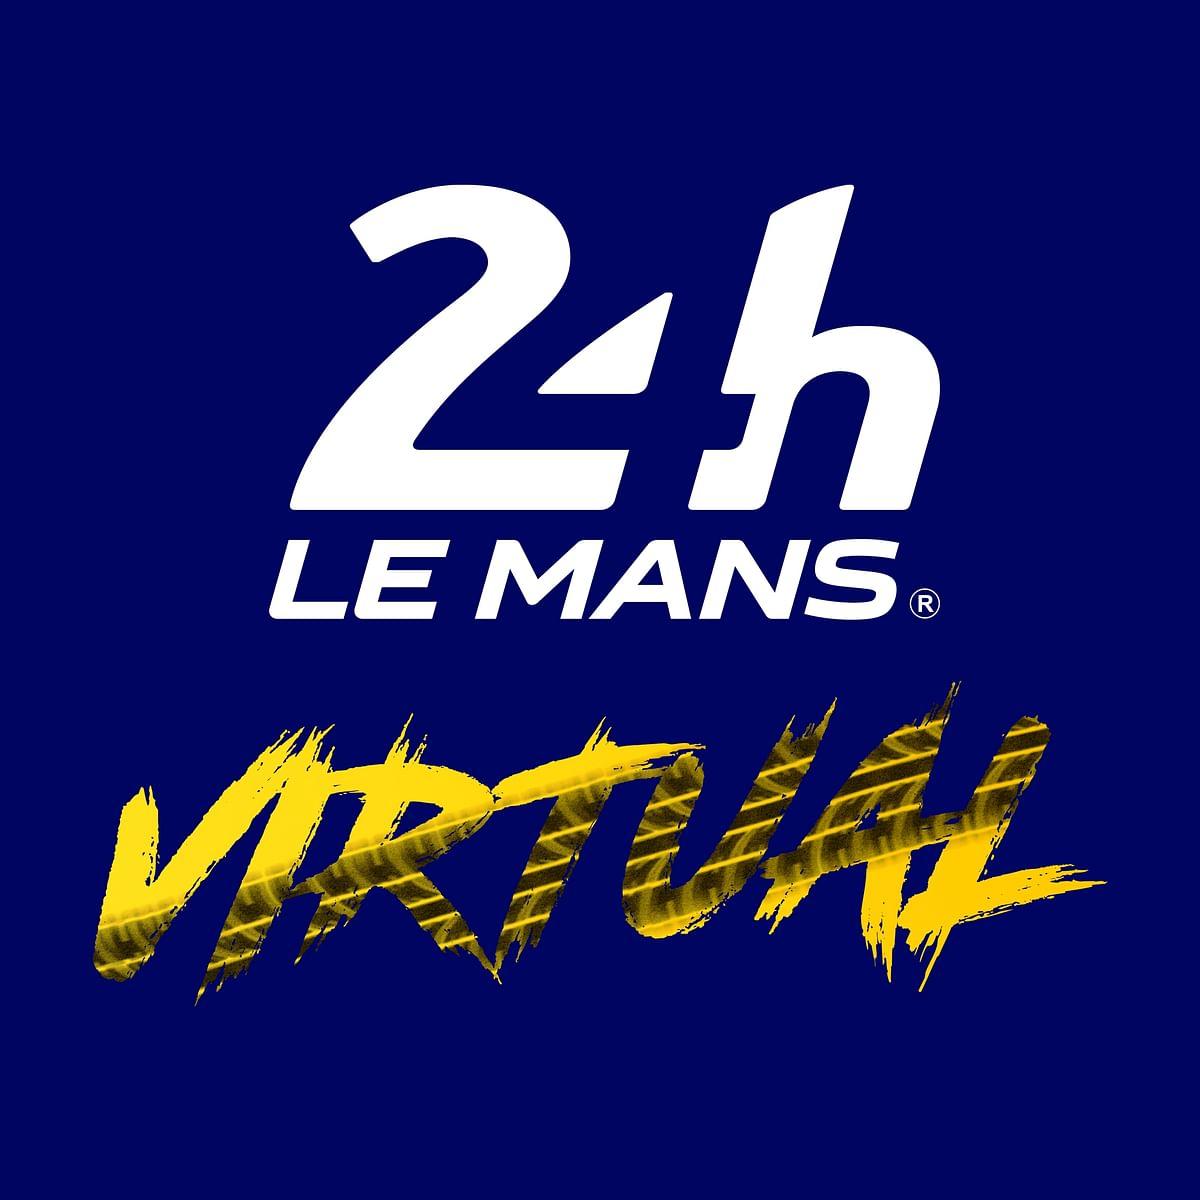 WEC Esports LeMans24 logo